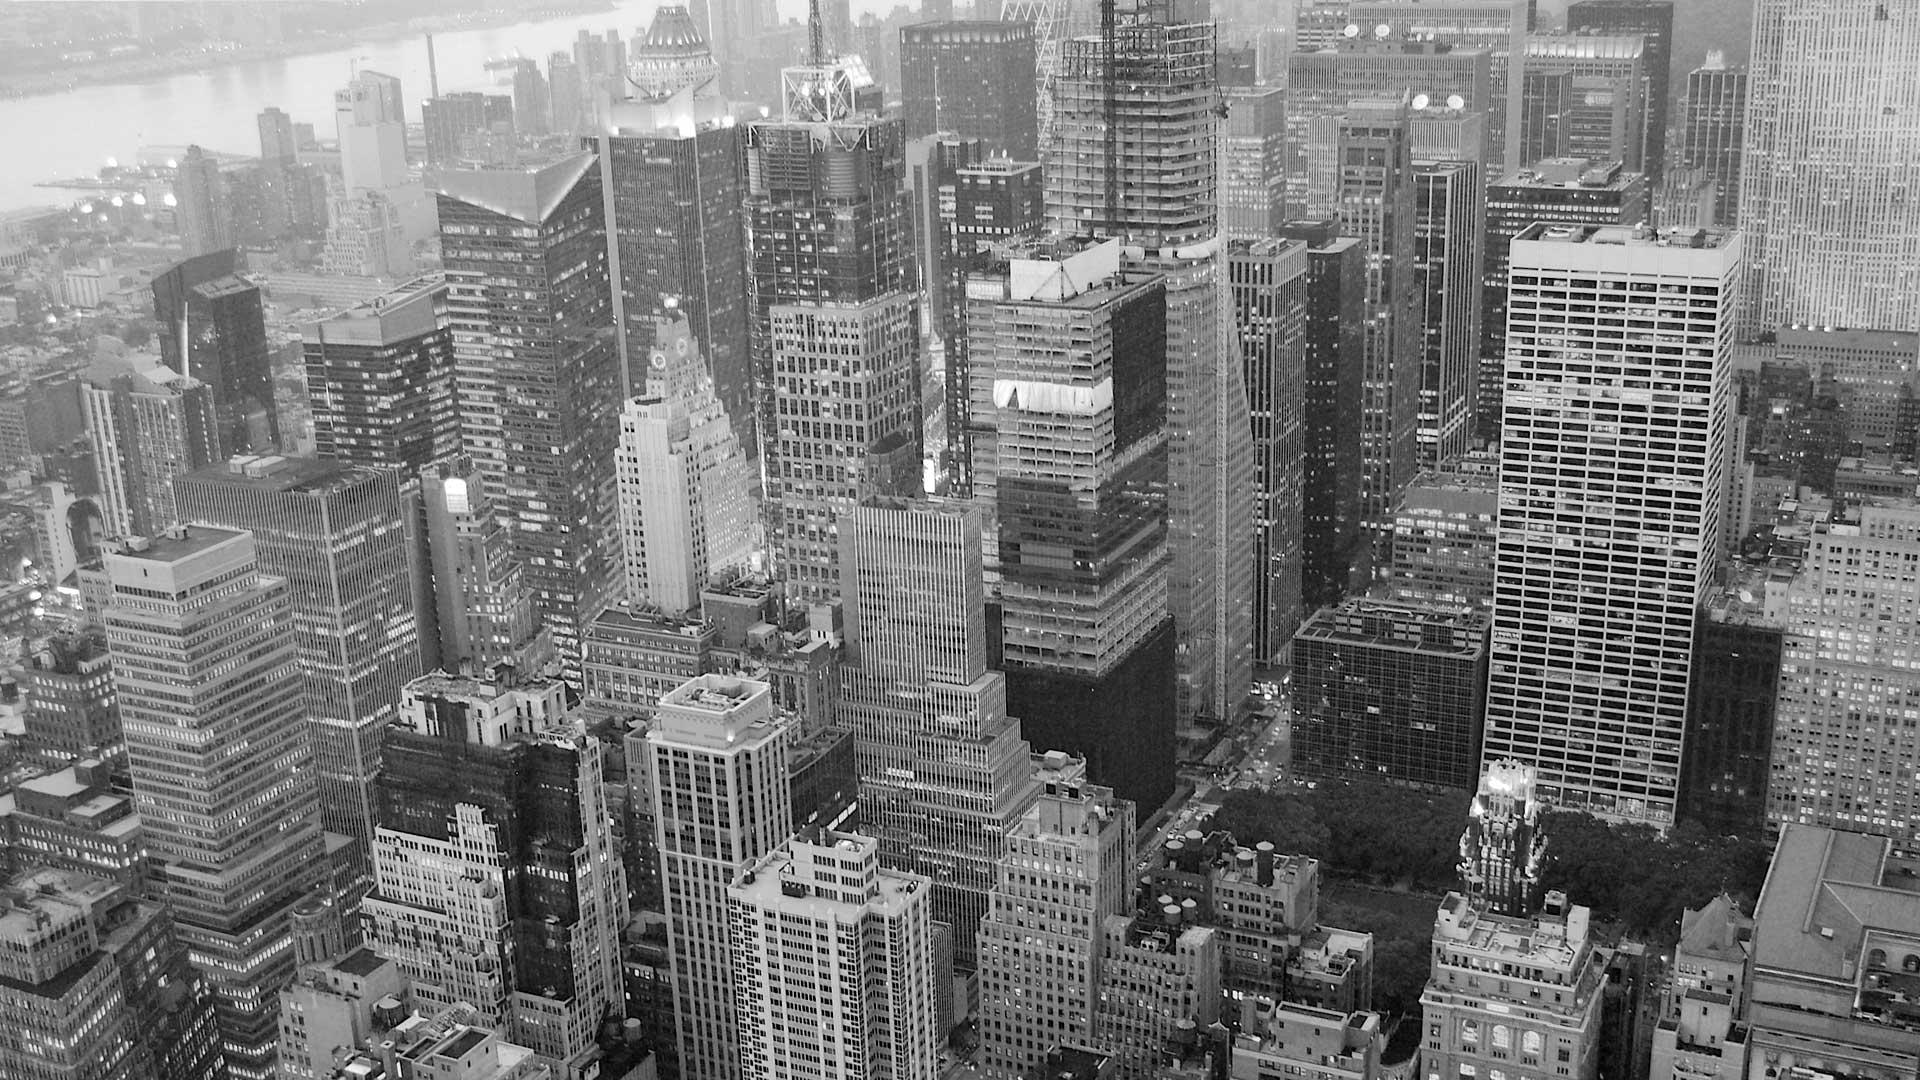 Manhattan, New York City, NY - Copyright: Xzelenz Media